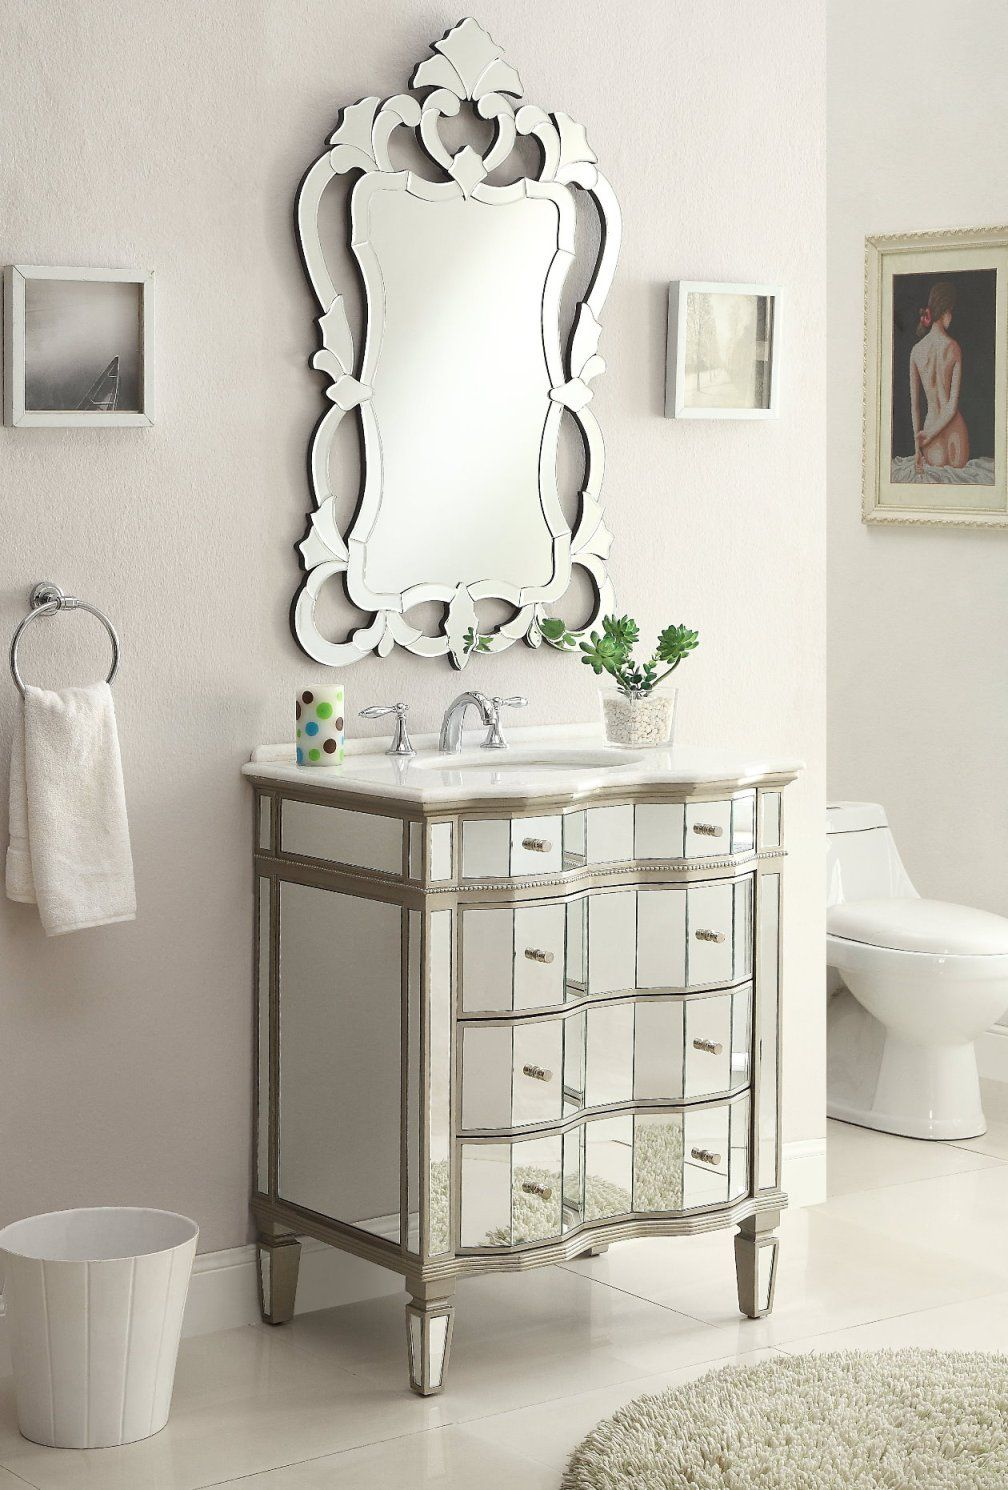 Adelina 30 inch Mirrored Bath Vanity Cabinet & Mirror | bathroom ...